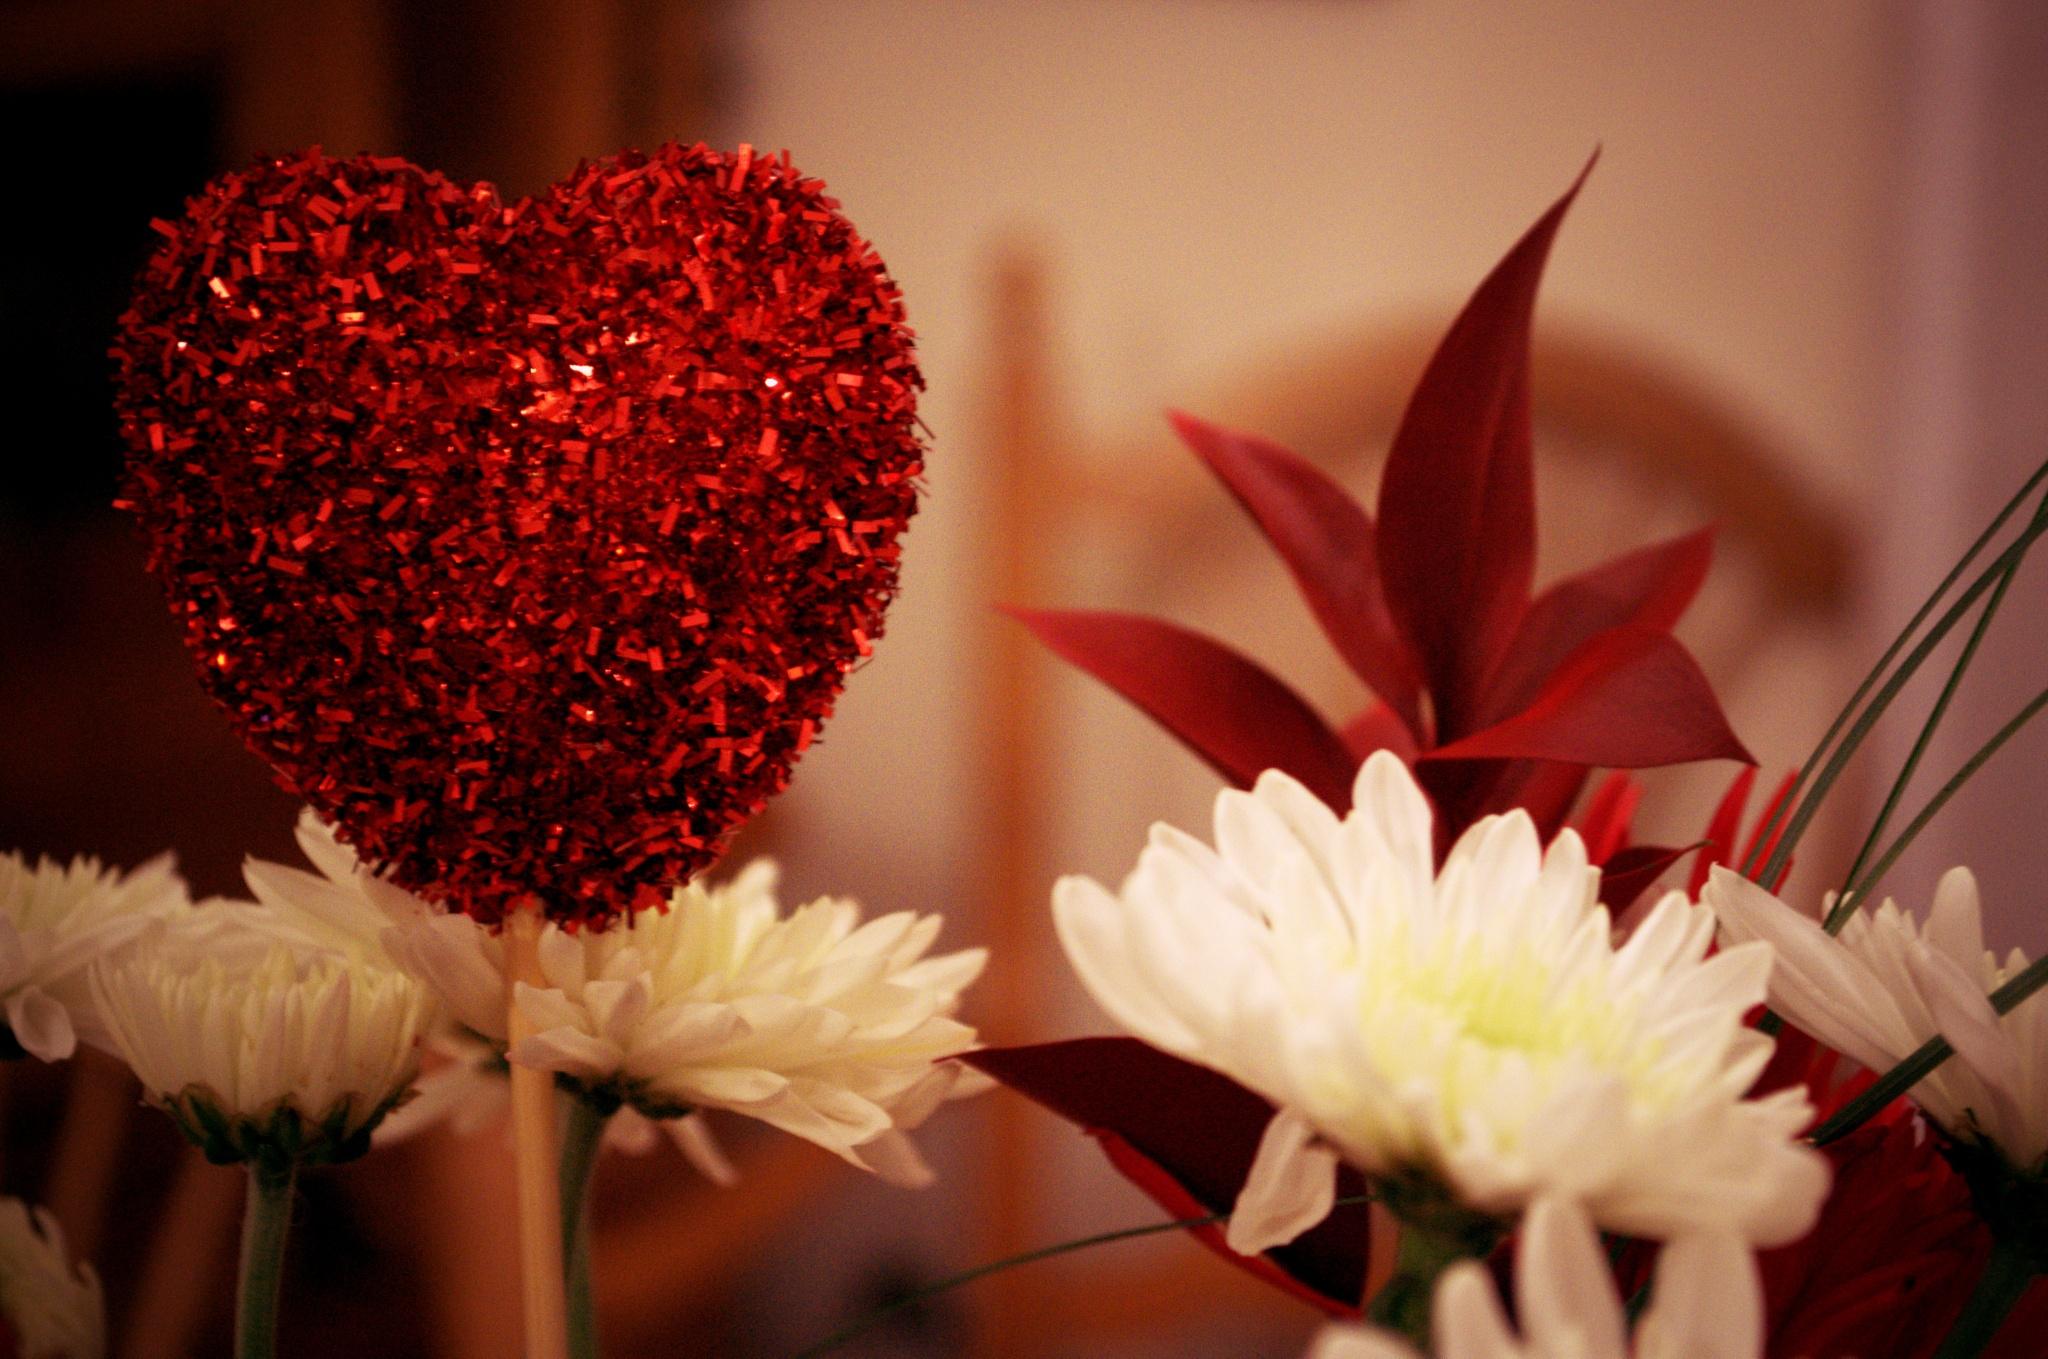 Valentines flowers by Trevor Smith